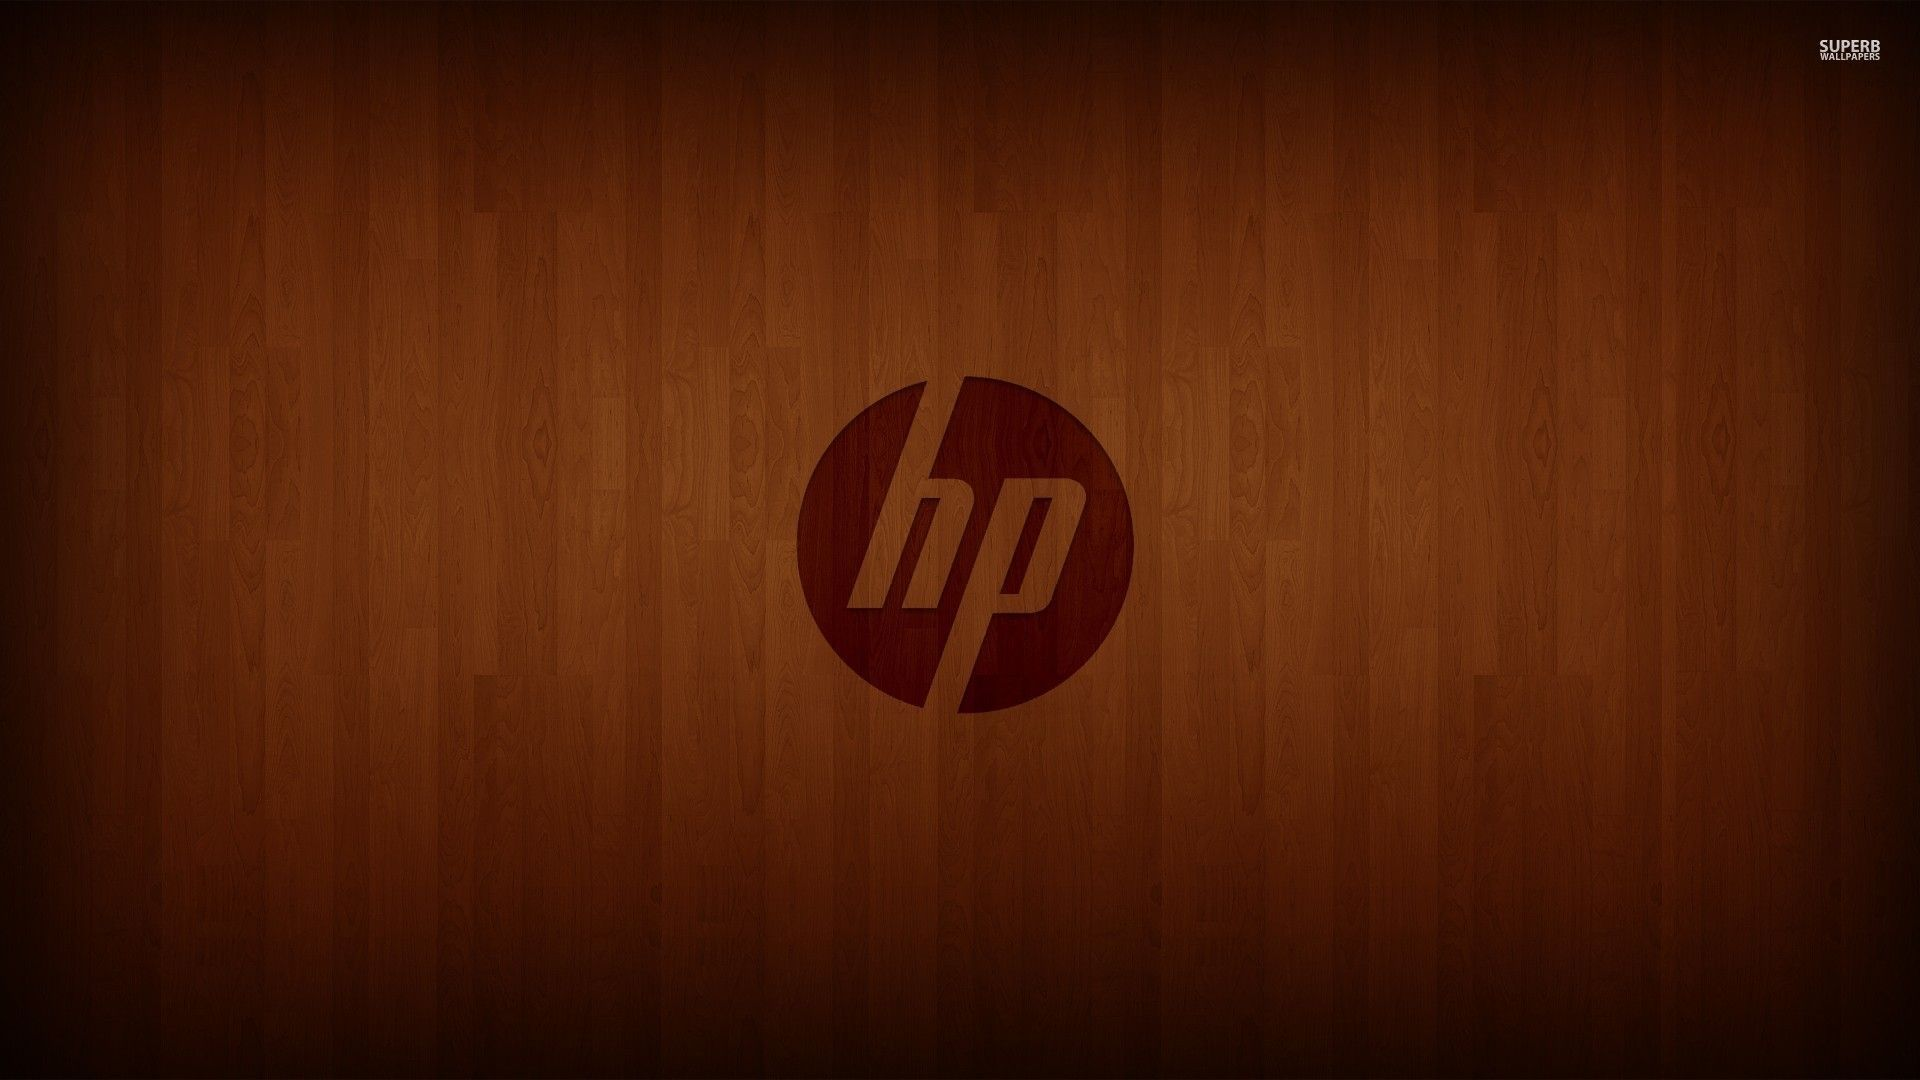 Hp Logo Wallpapers Wallpaper 1920 1080 Hp Elitebook Wallpapers 41 Wallpapers Adorable W Wallpaper Images Hd Cool Wallpapers For Laptop Hd Cool Wallpapers